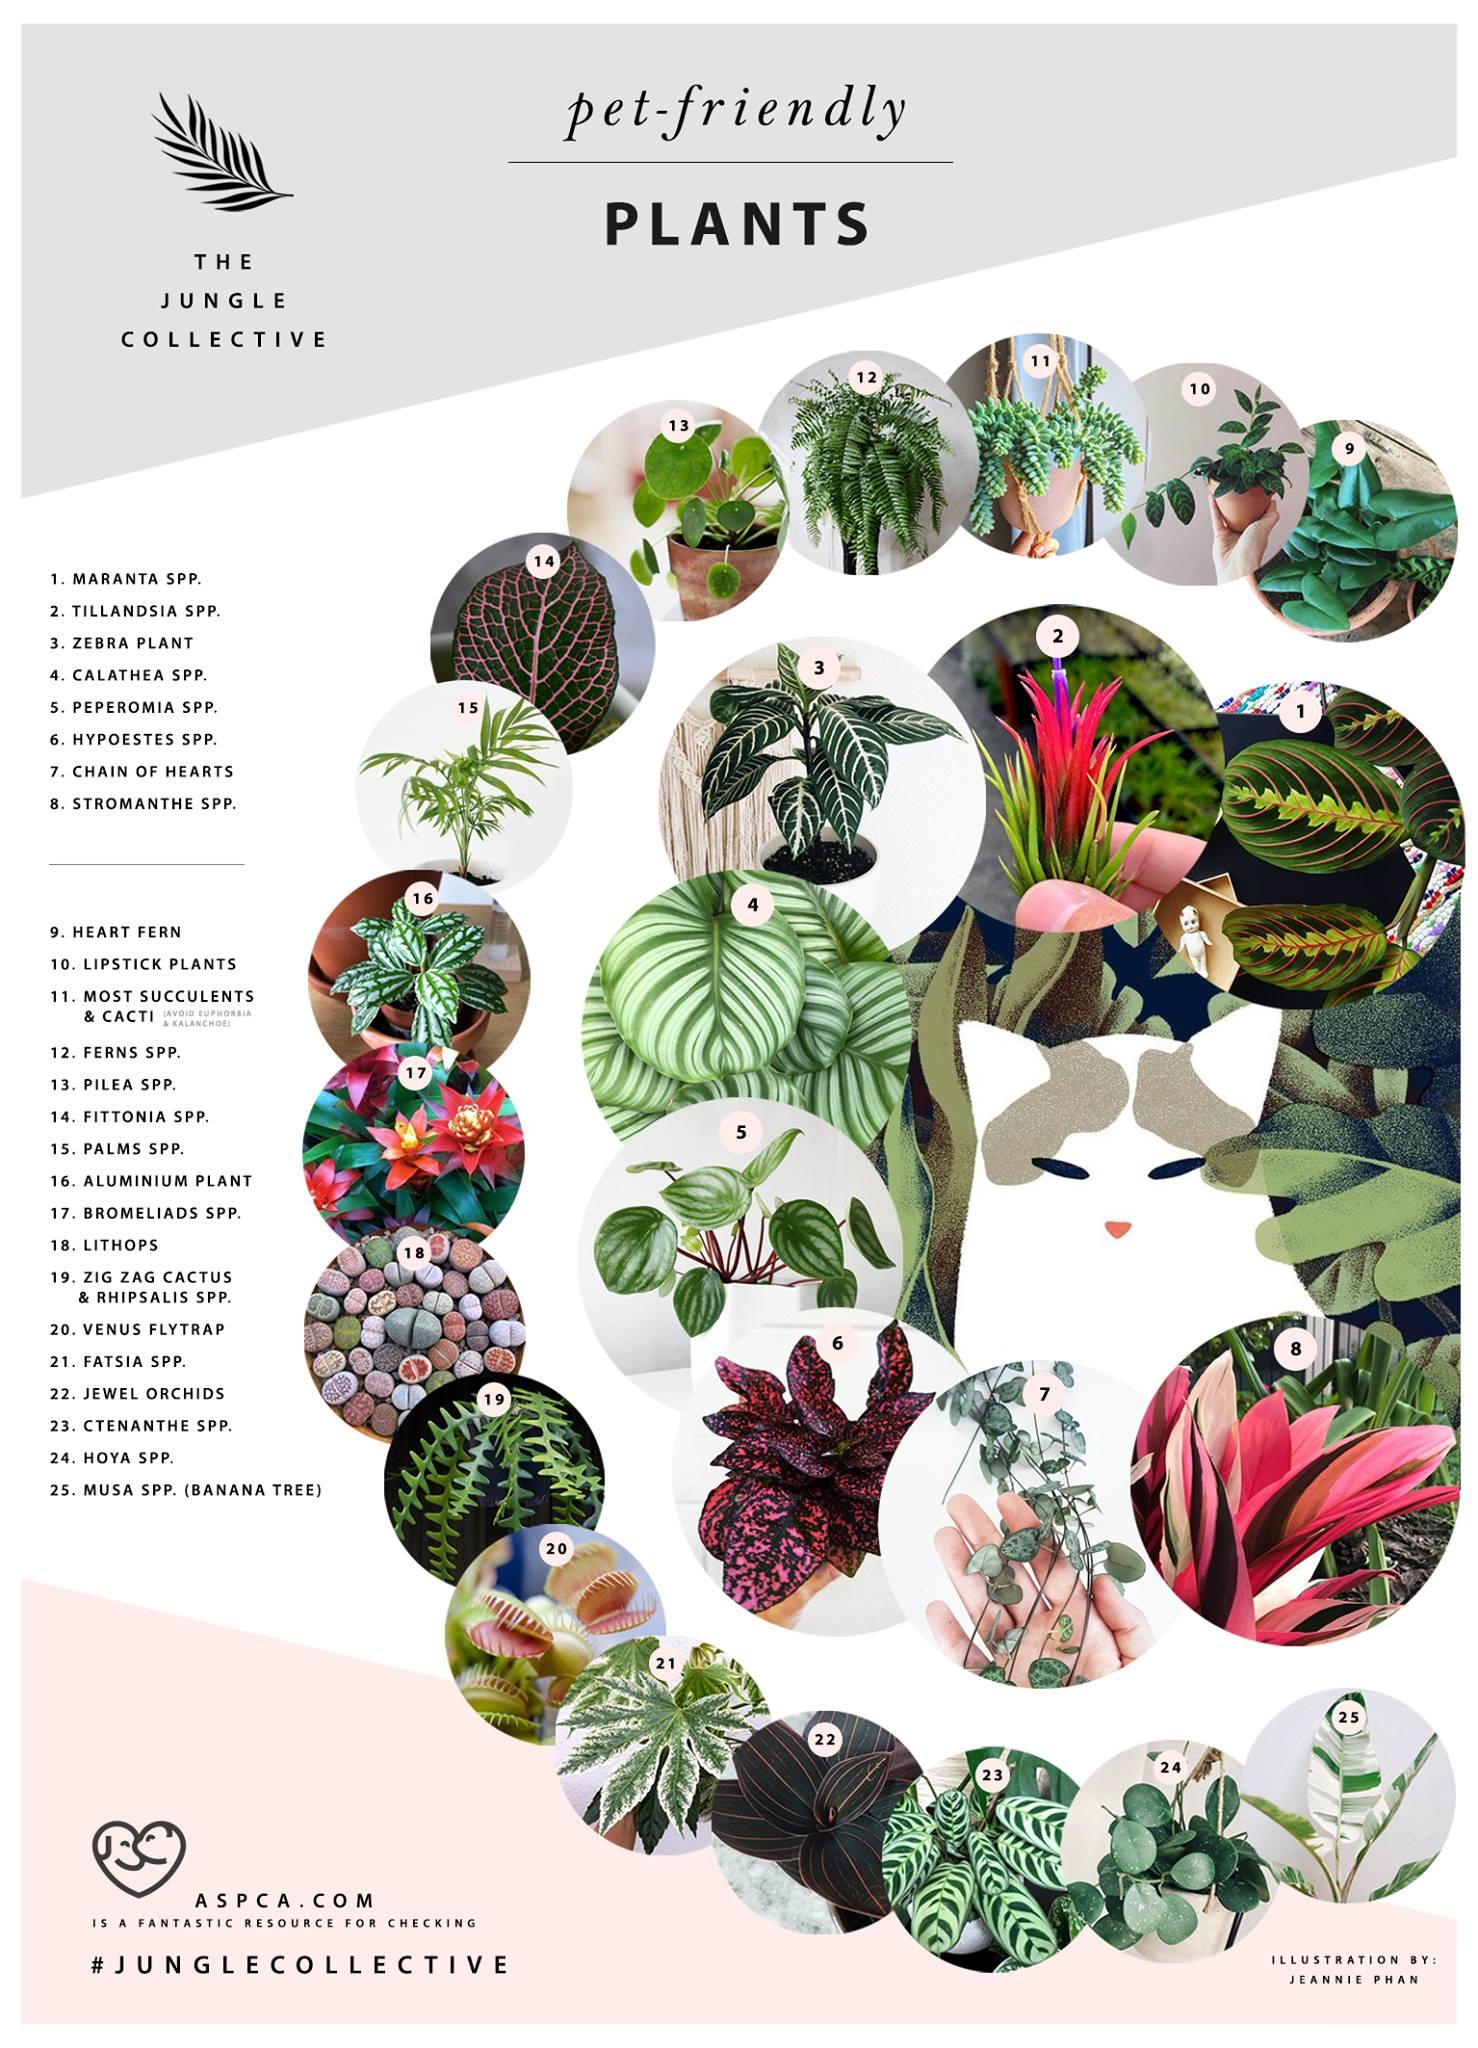 Pet Friendly Plants - The Jungle Collective